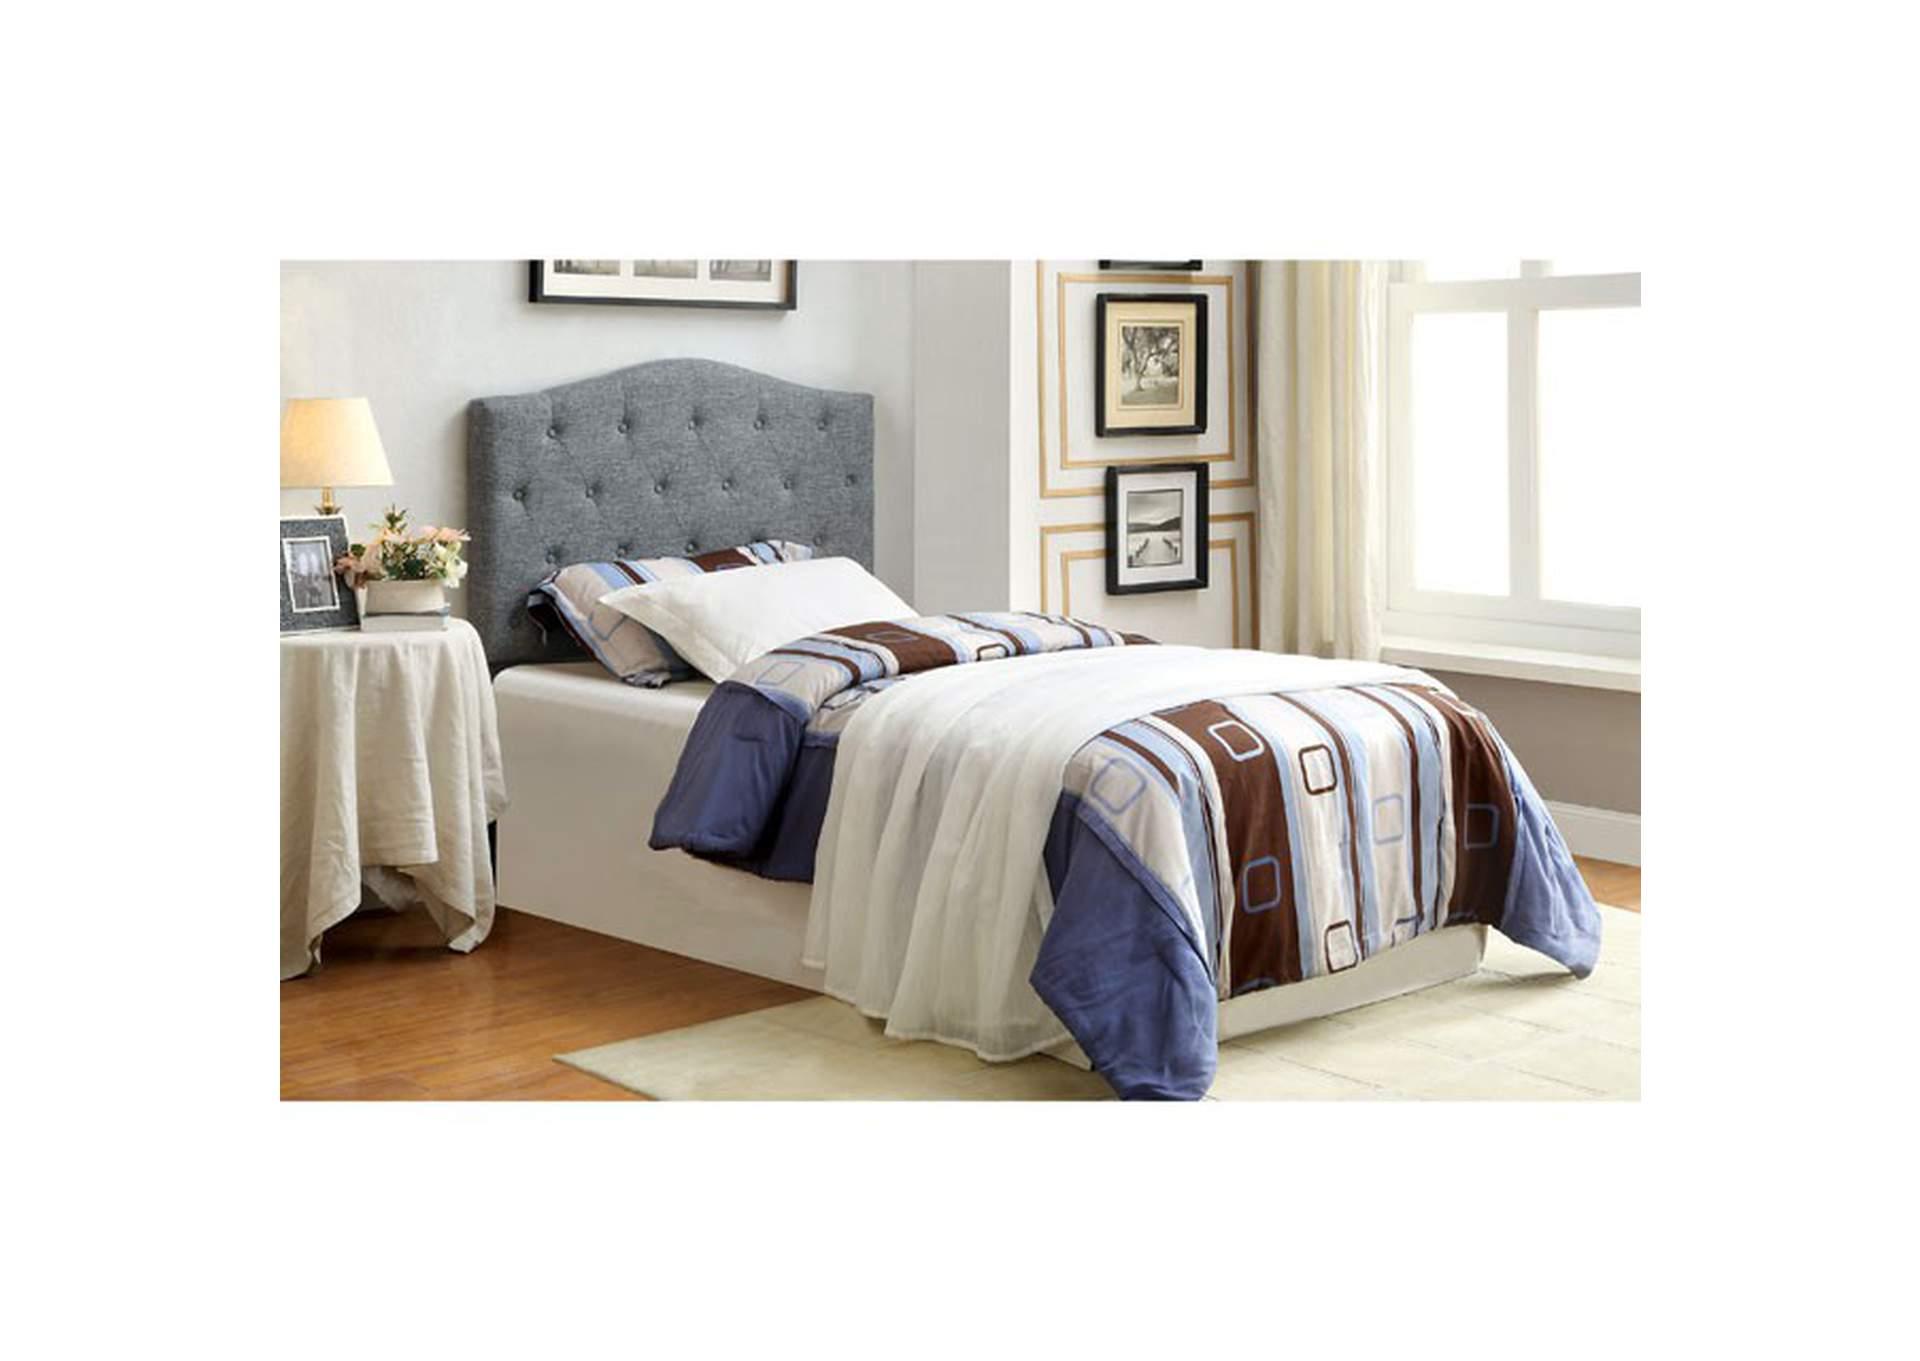 Alipaz Grey Twin Headboard Best Buy Furniture And Mattress